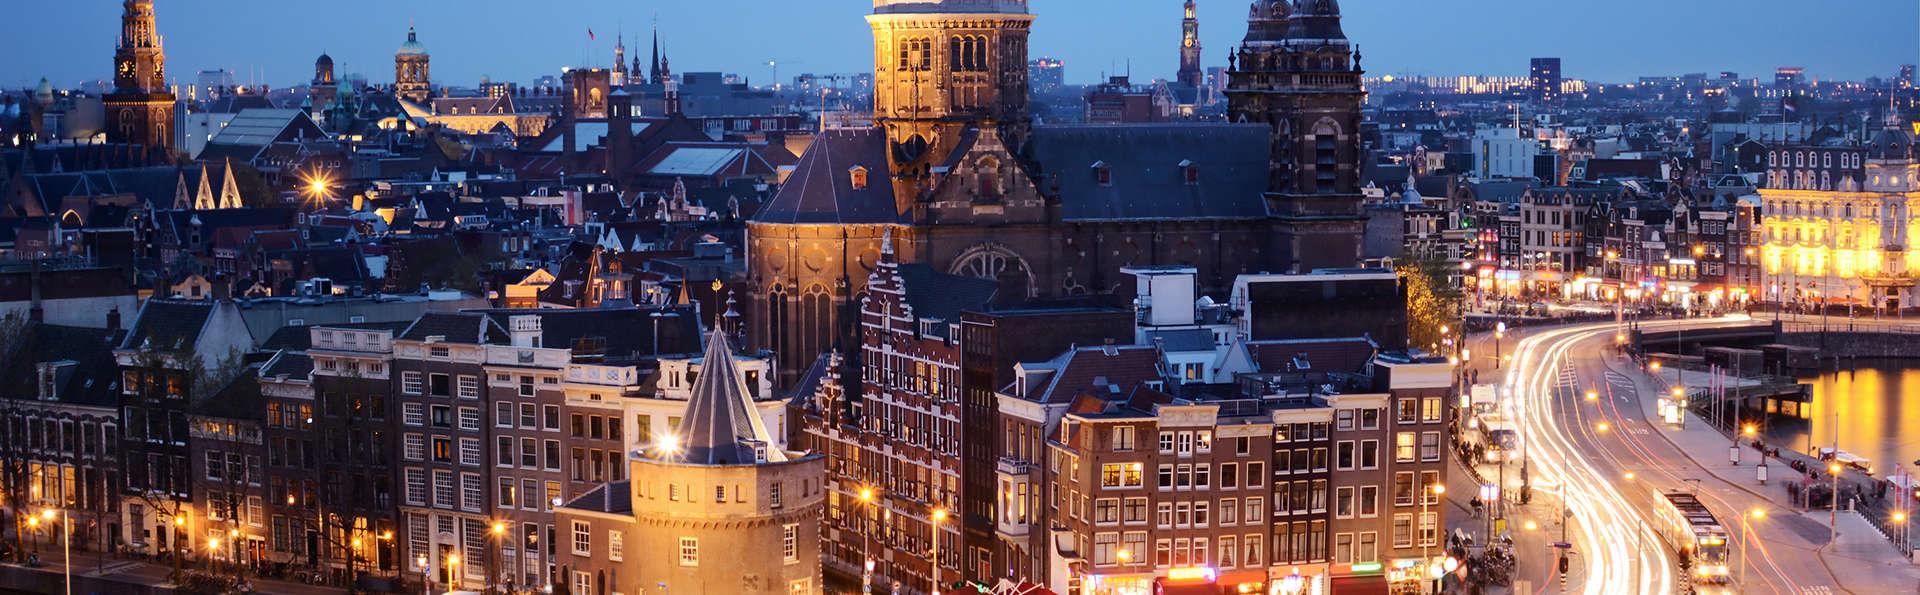 Hotel de Paris Amsterdam - Edit_Amsterdam13.jpg